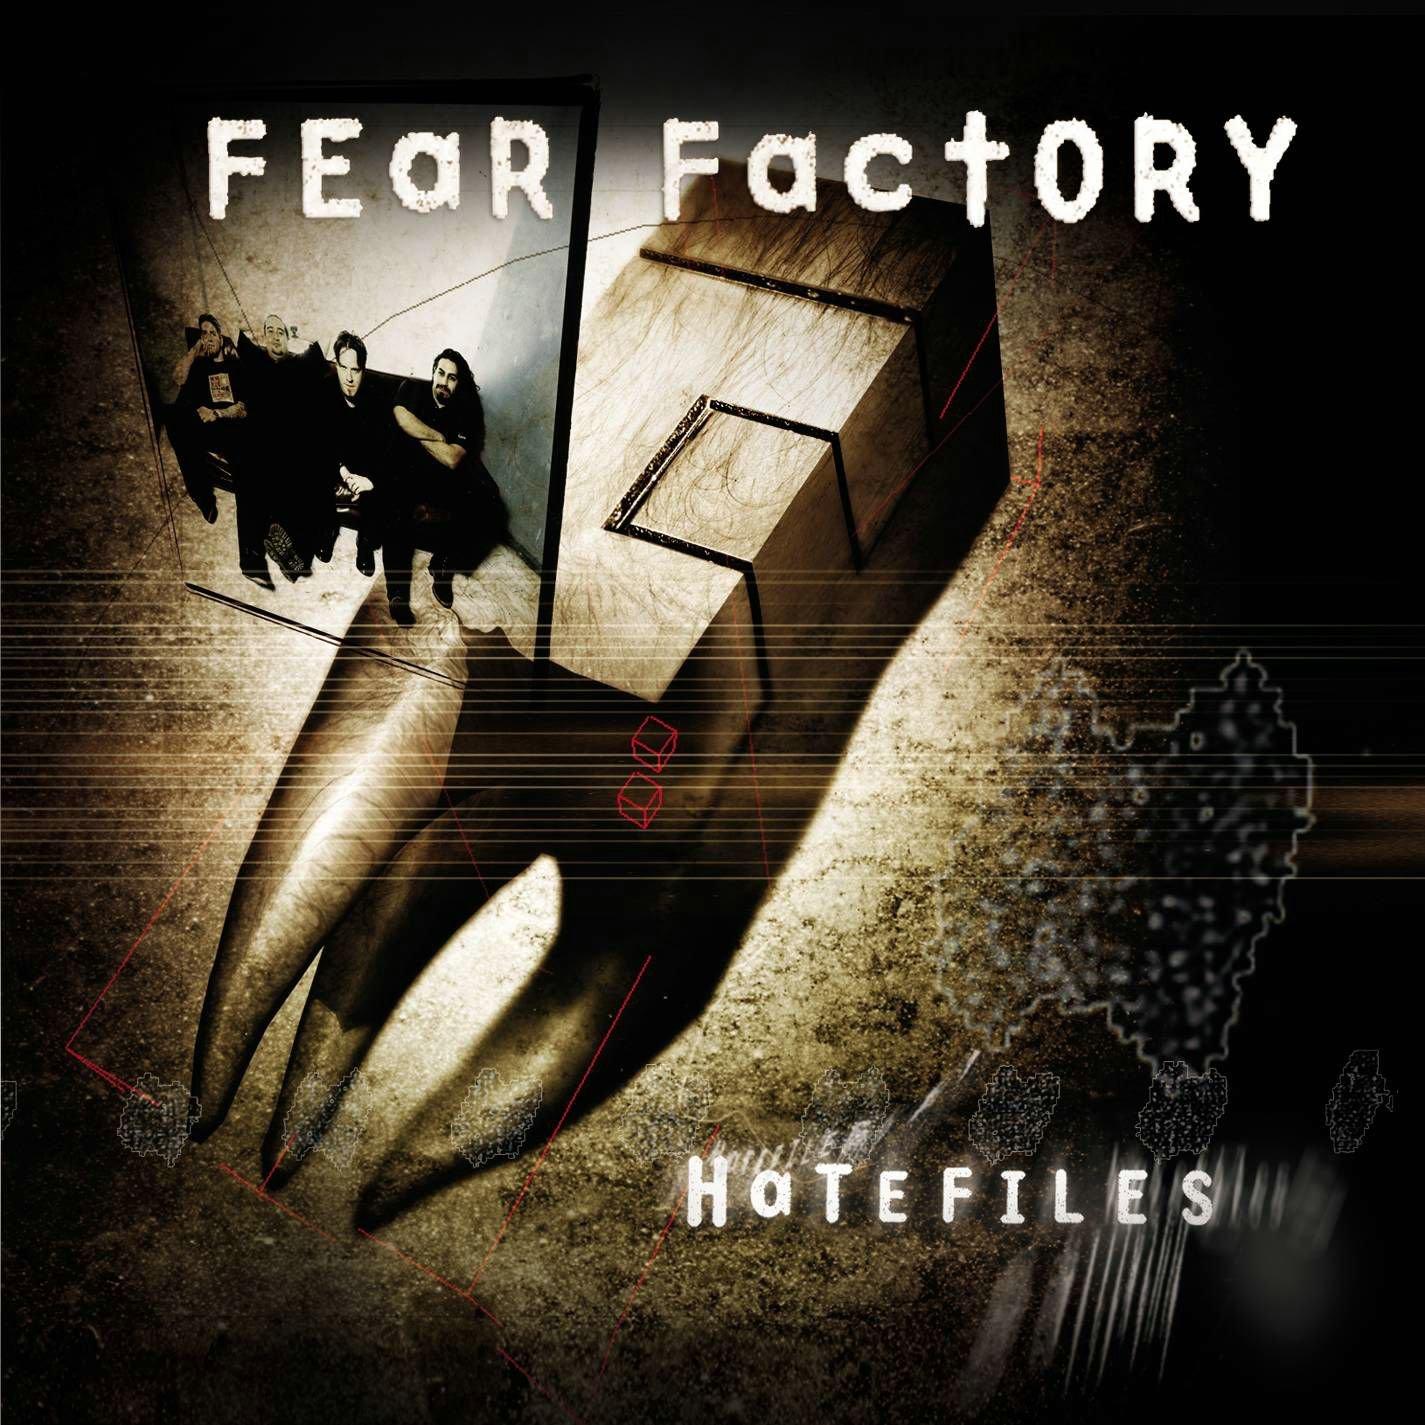 Hatefiles by Roadrunner Records